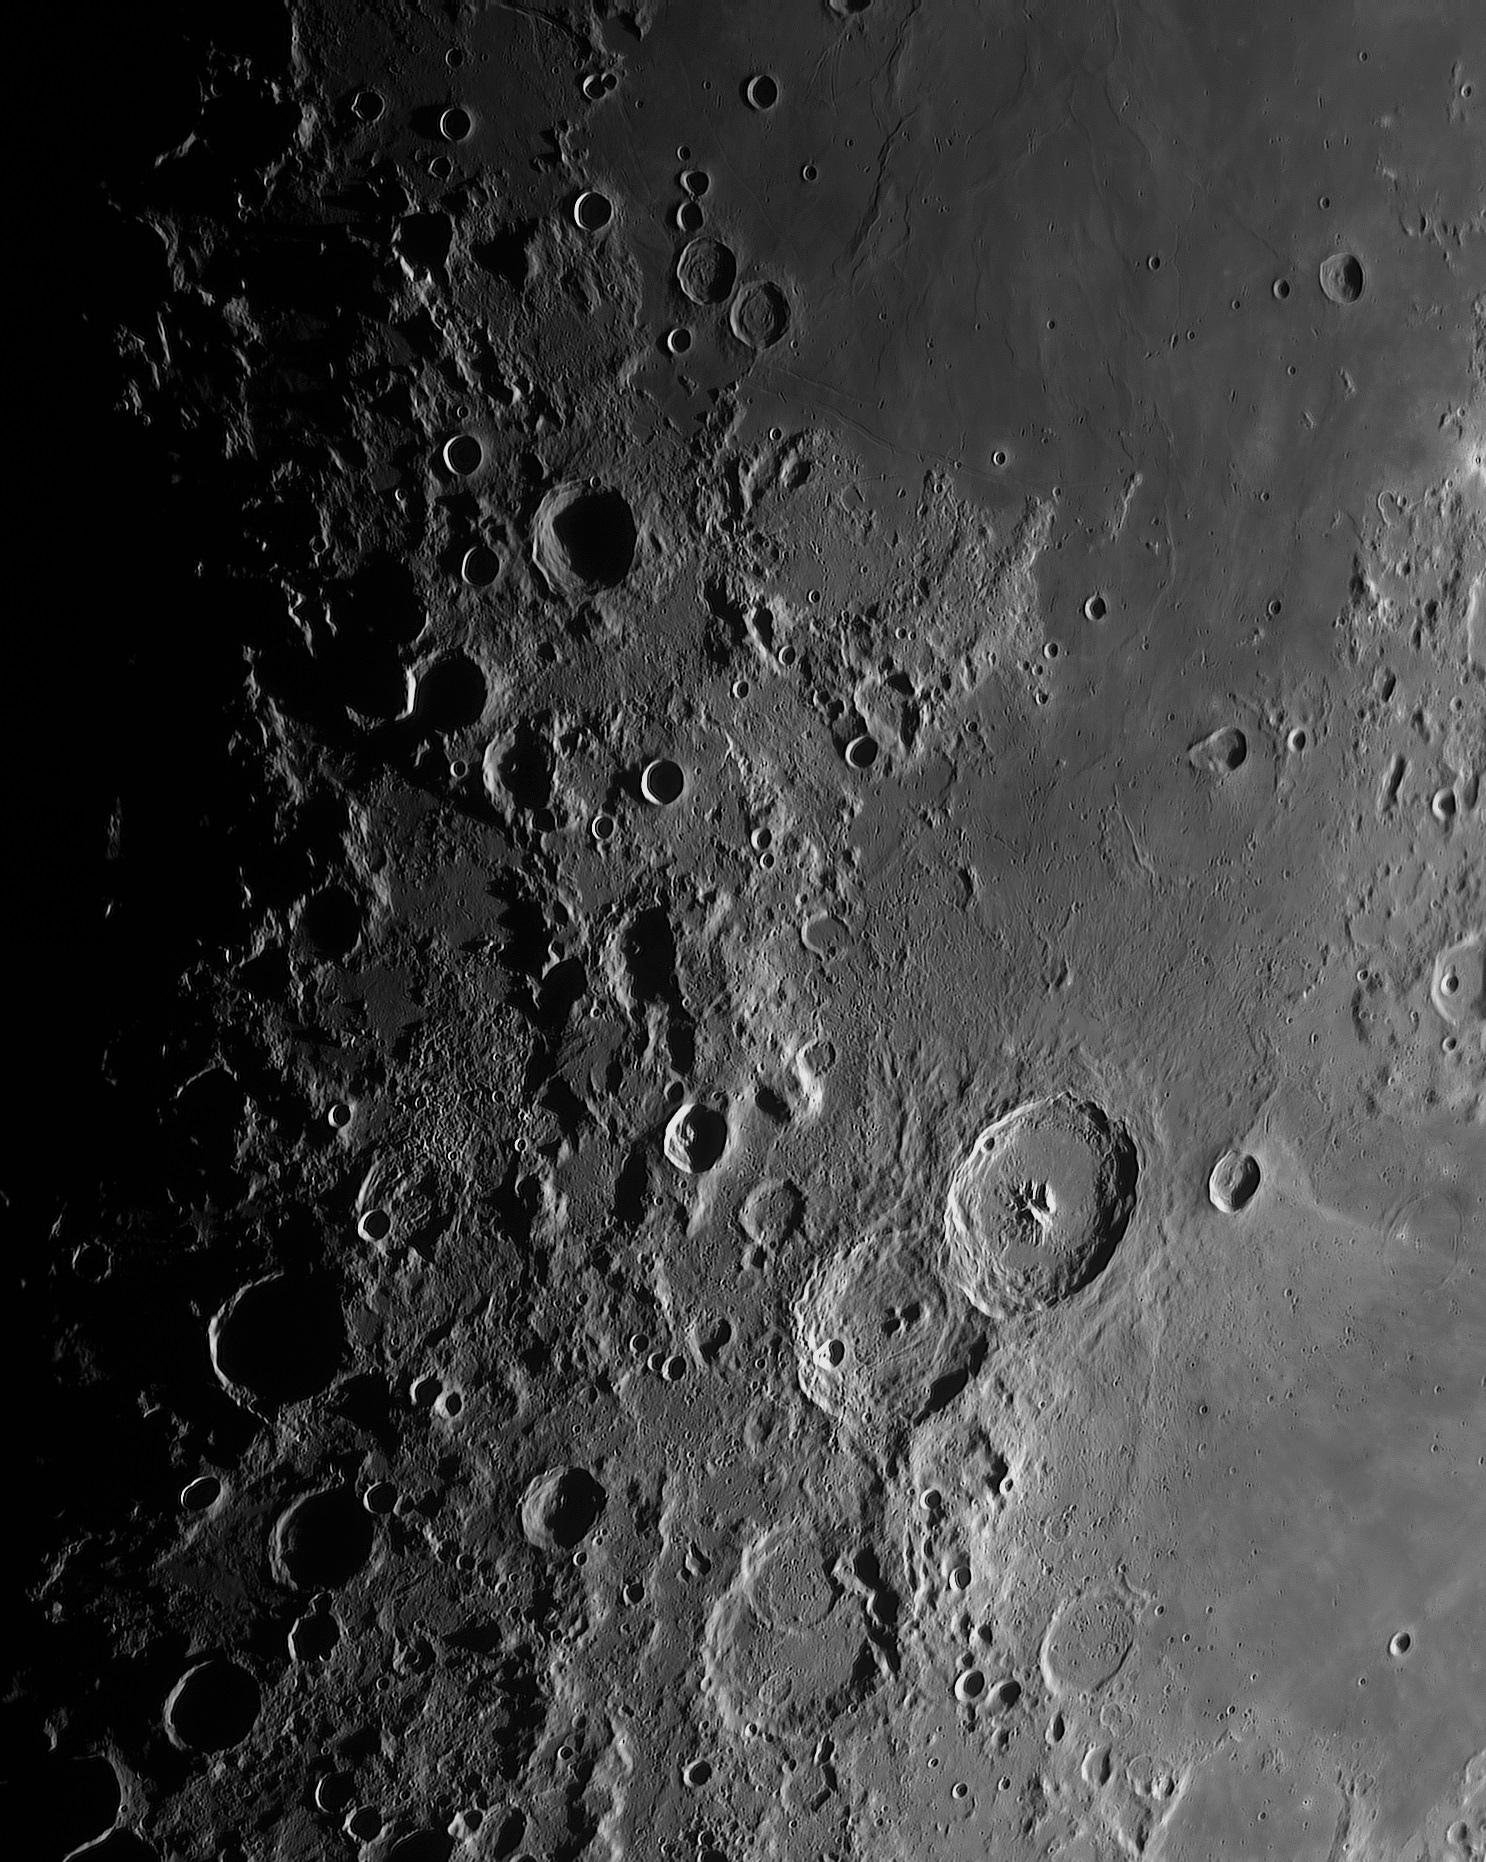 5e83a612d2ec8_lune30mars203.jpg.f22f03c0e1c1802aea113f70ee15d825.jpg